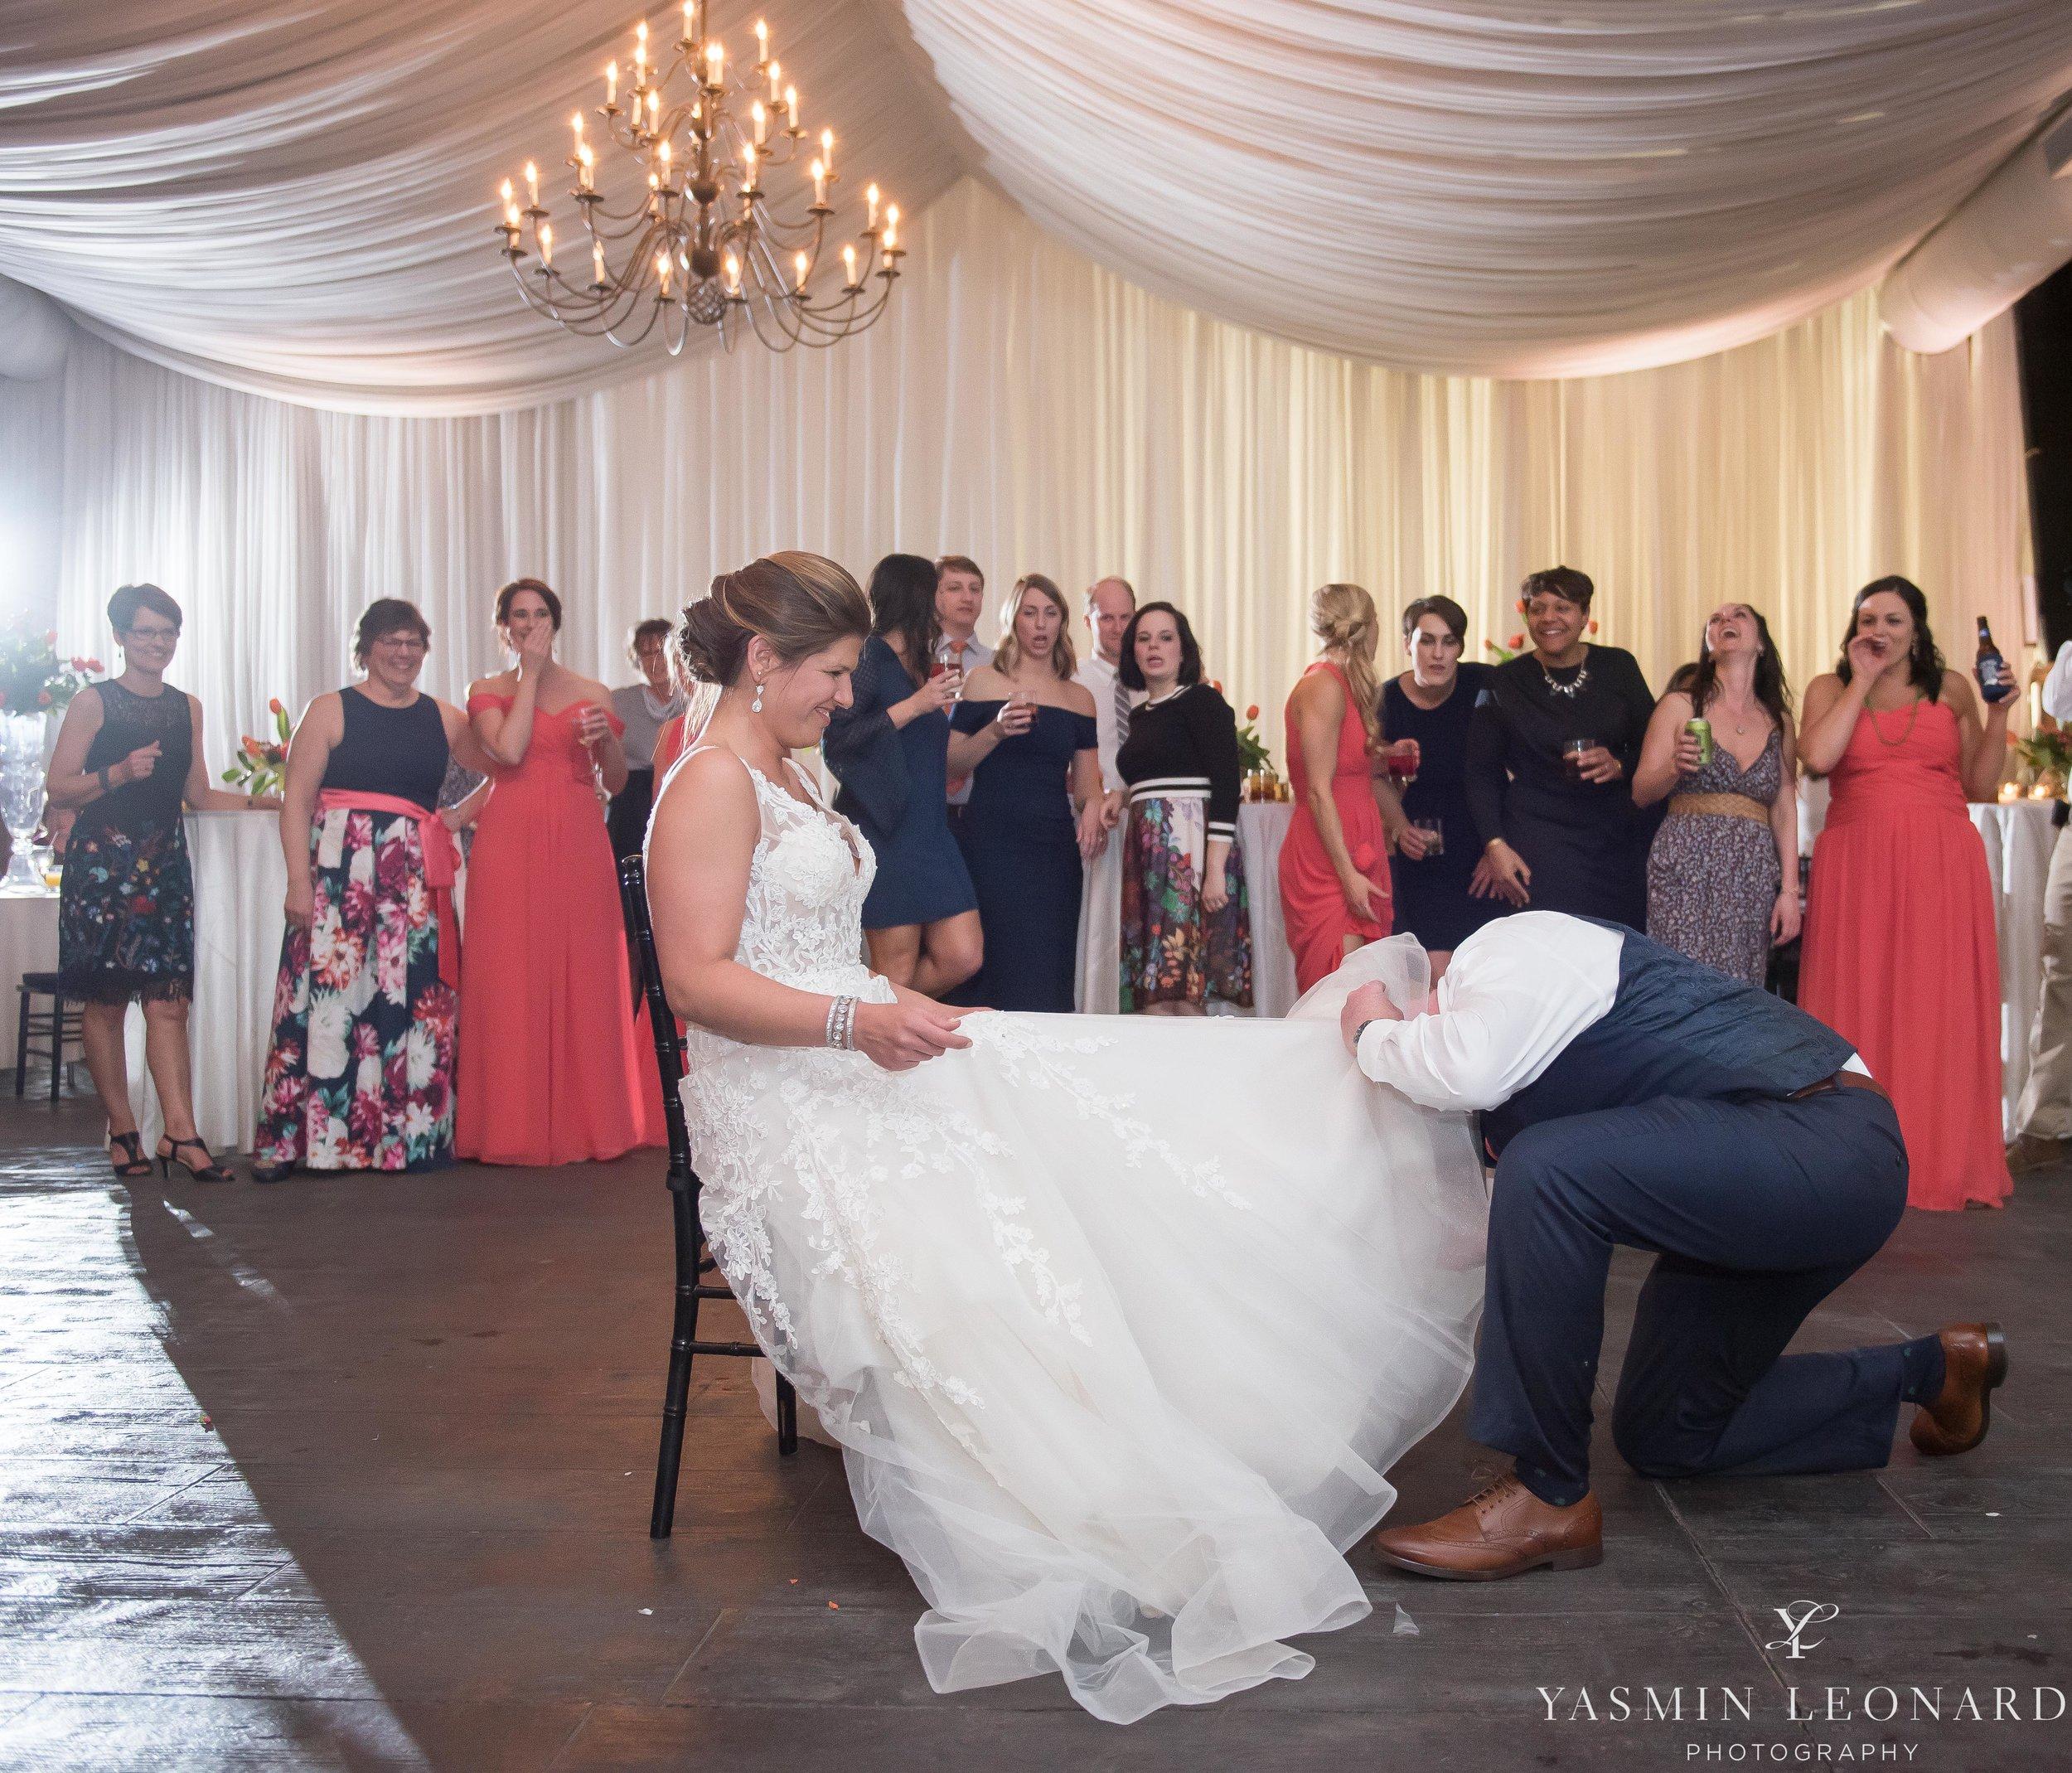 Adaumont Farm - Adaumont Farm Weddings - Trinity Weddings - NC Weddings - Yasmin Leonard Photography-92.jpg